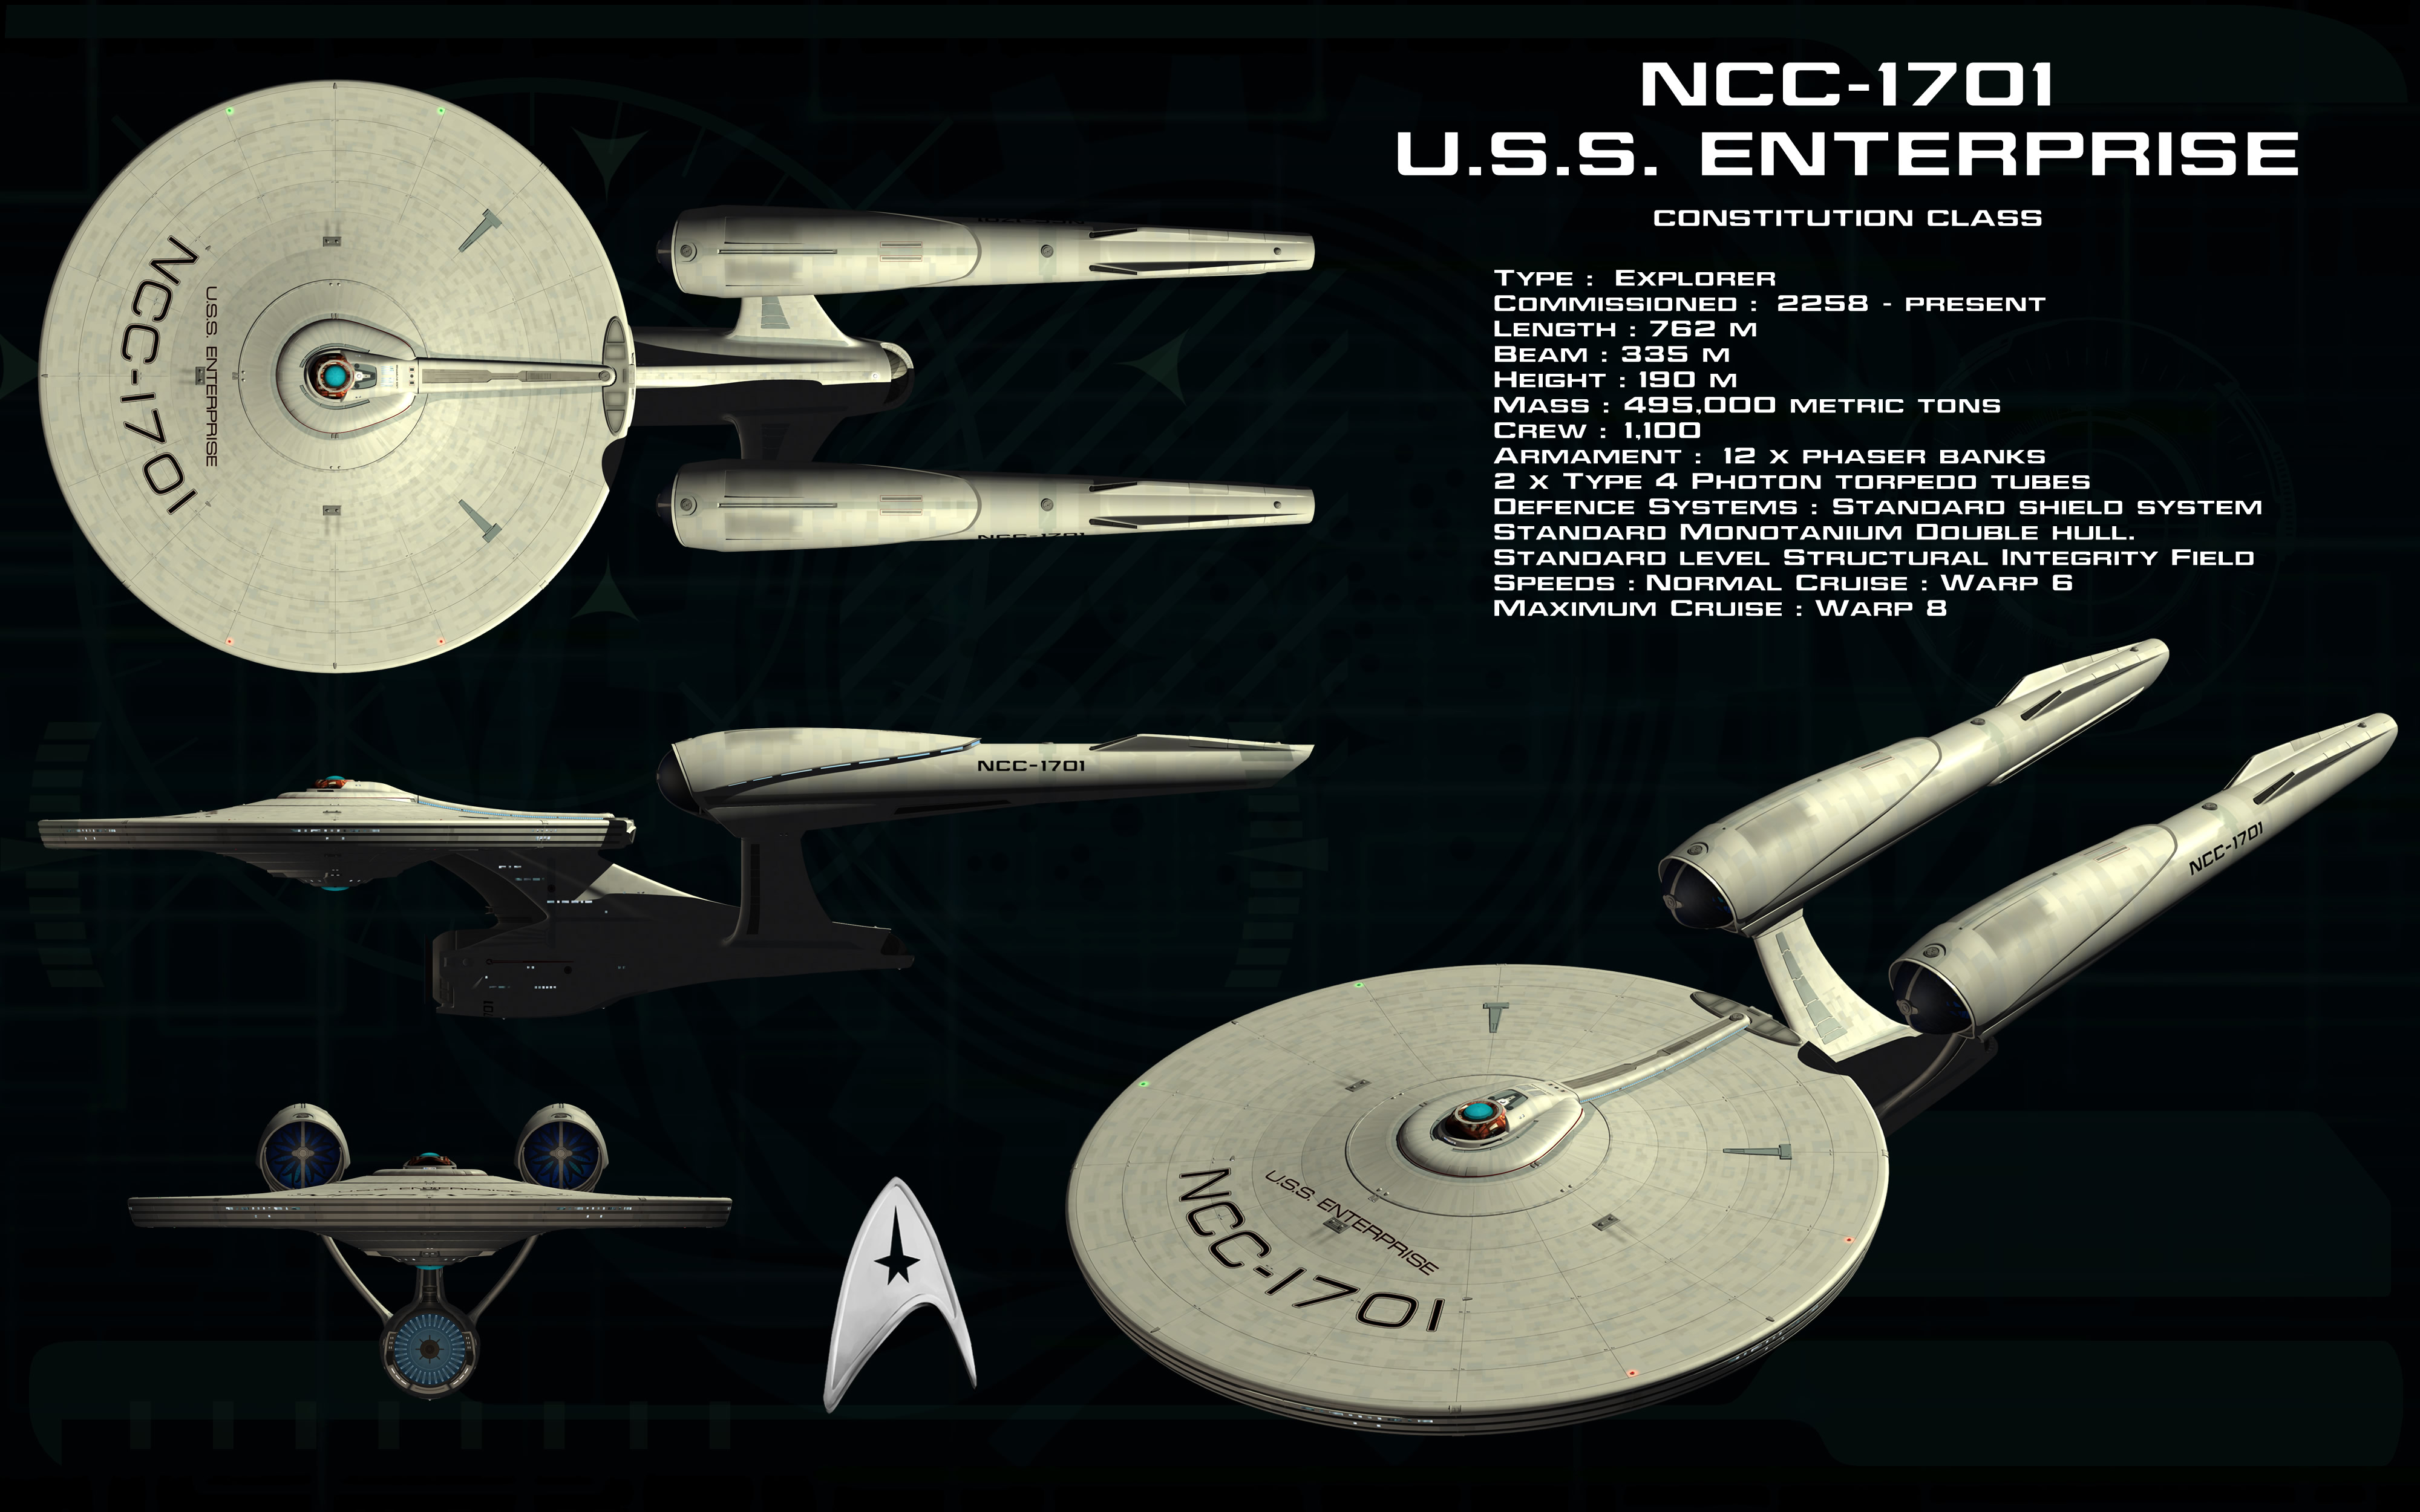 Constitution Class Ortho AU 419131700 on Star Trek Starship Parts